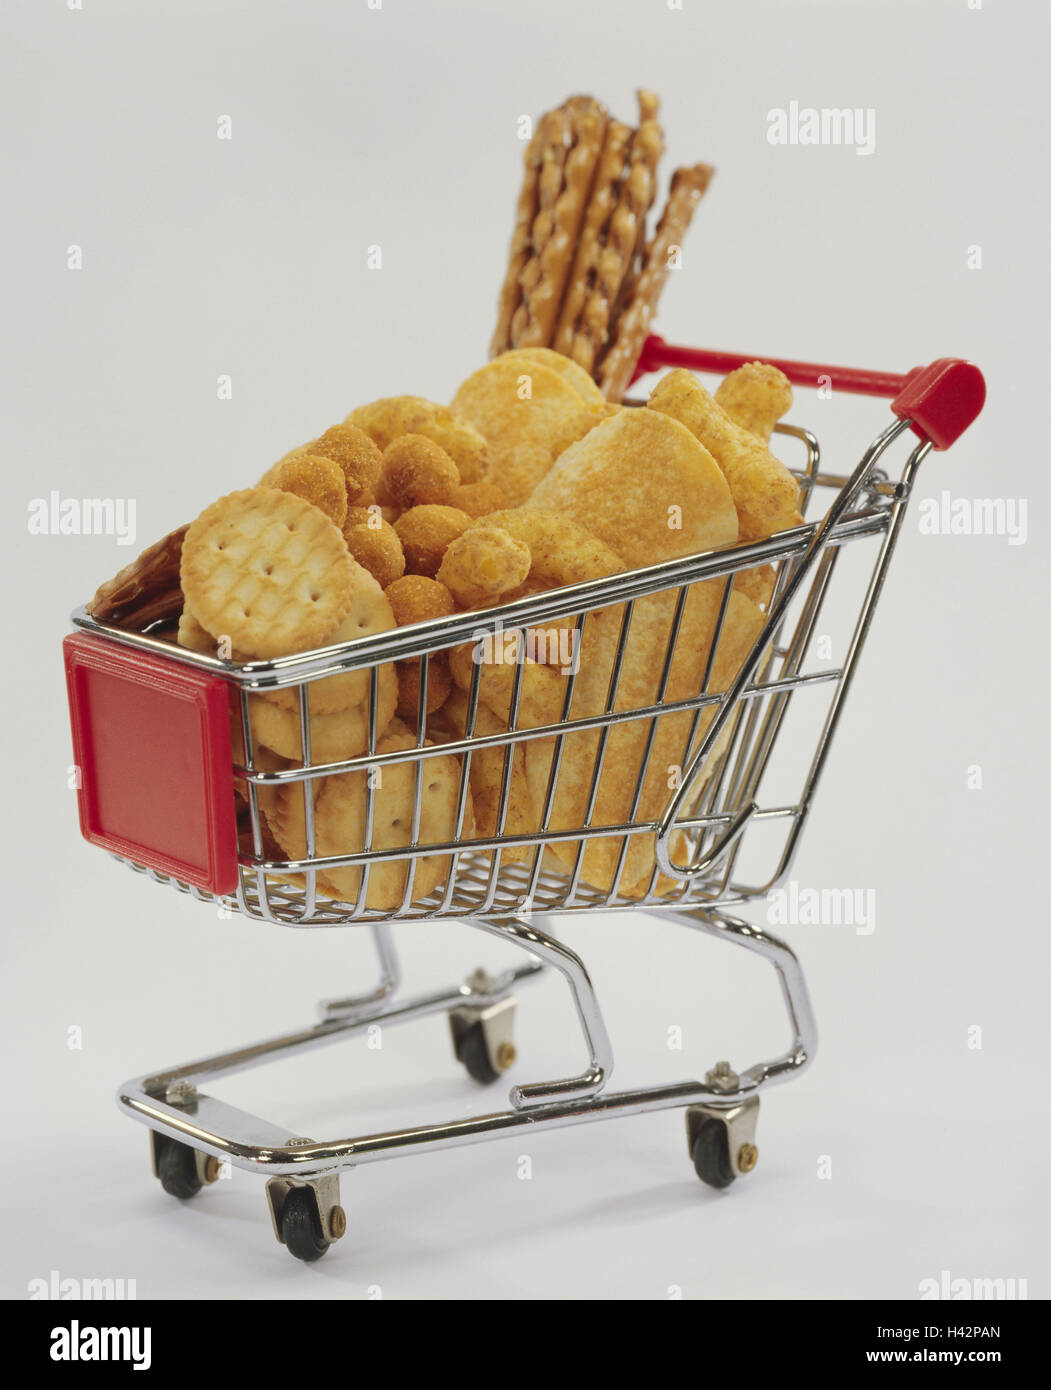 Shopping carts, miniature, savory snacks, cake, breadsticks, shopping, Knabbermischung, saltsticks, nutrition, retail - Stock Image